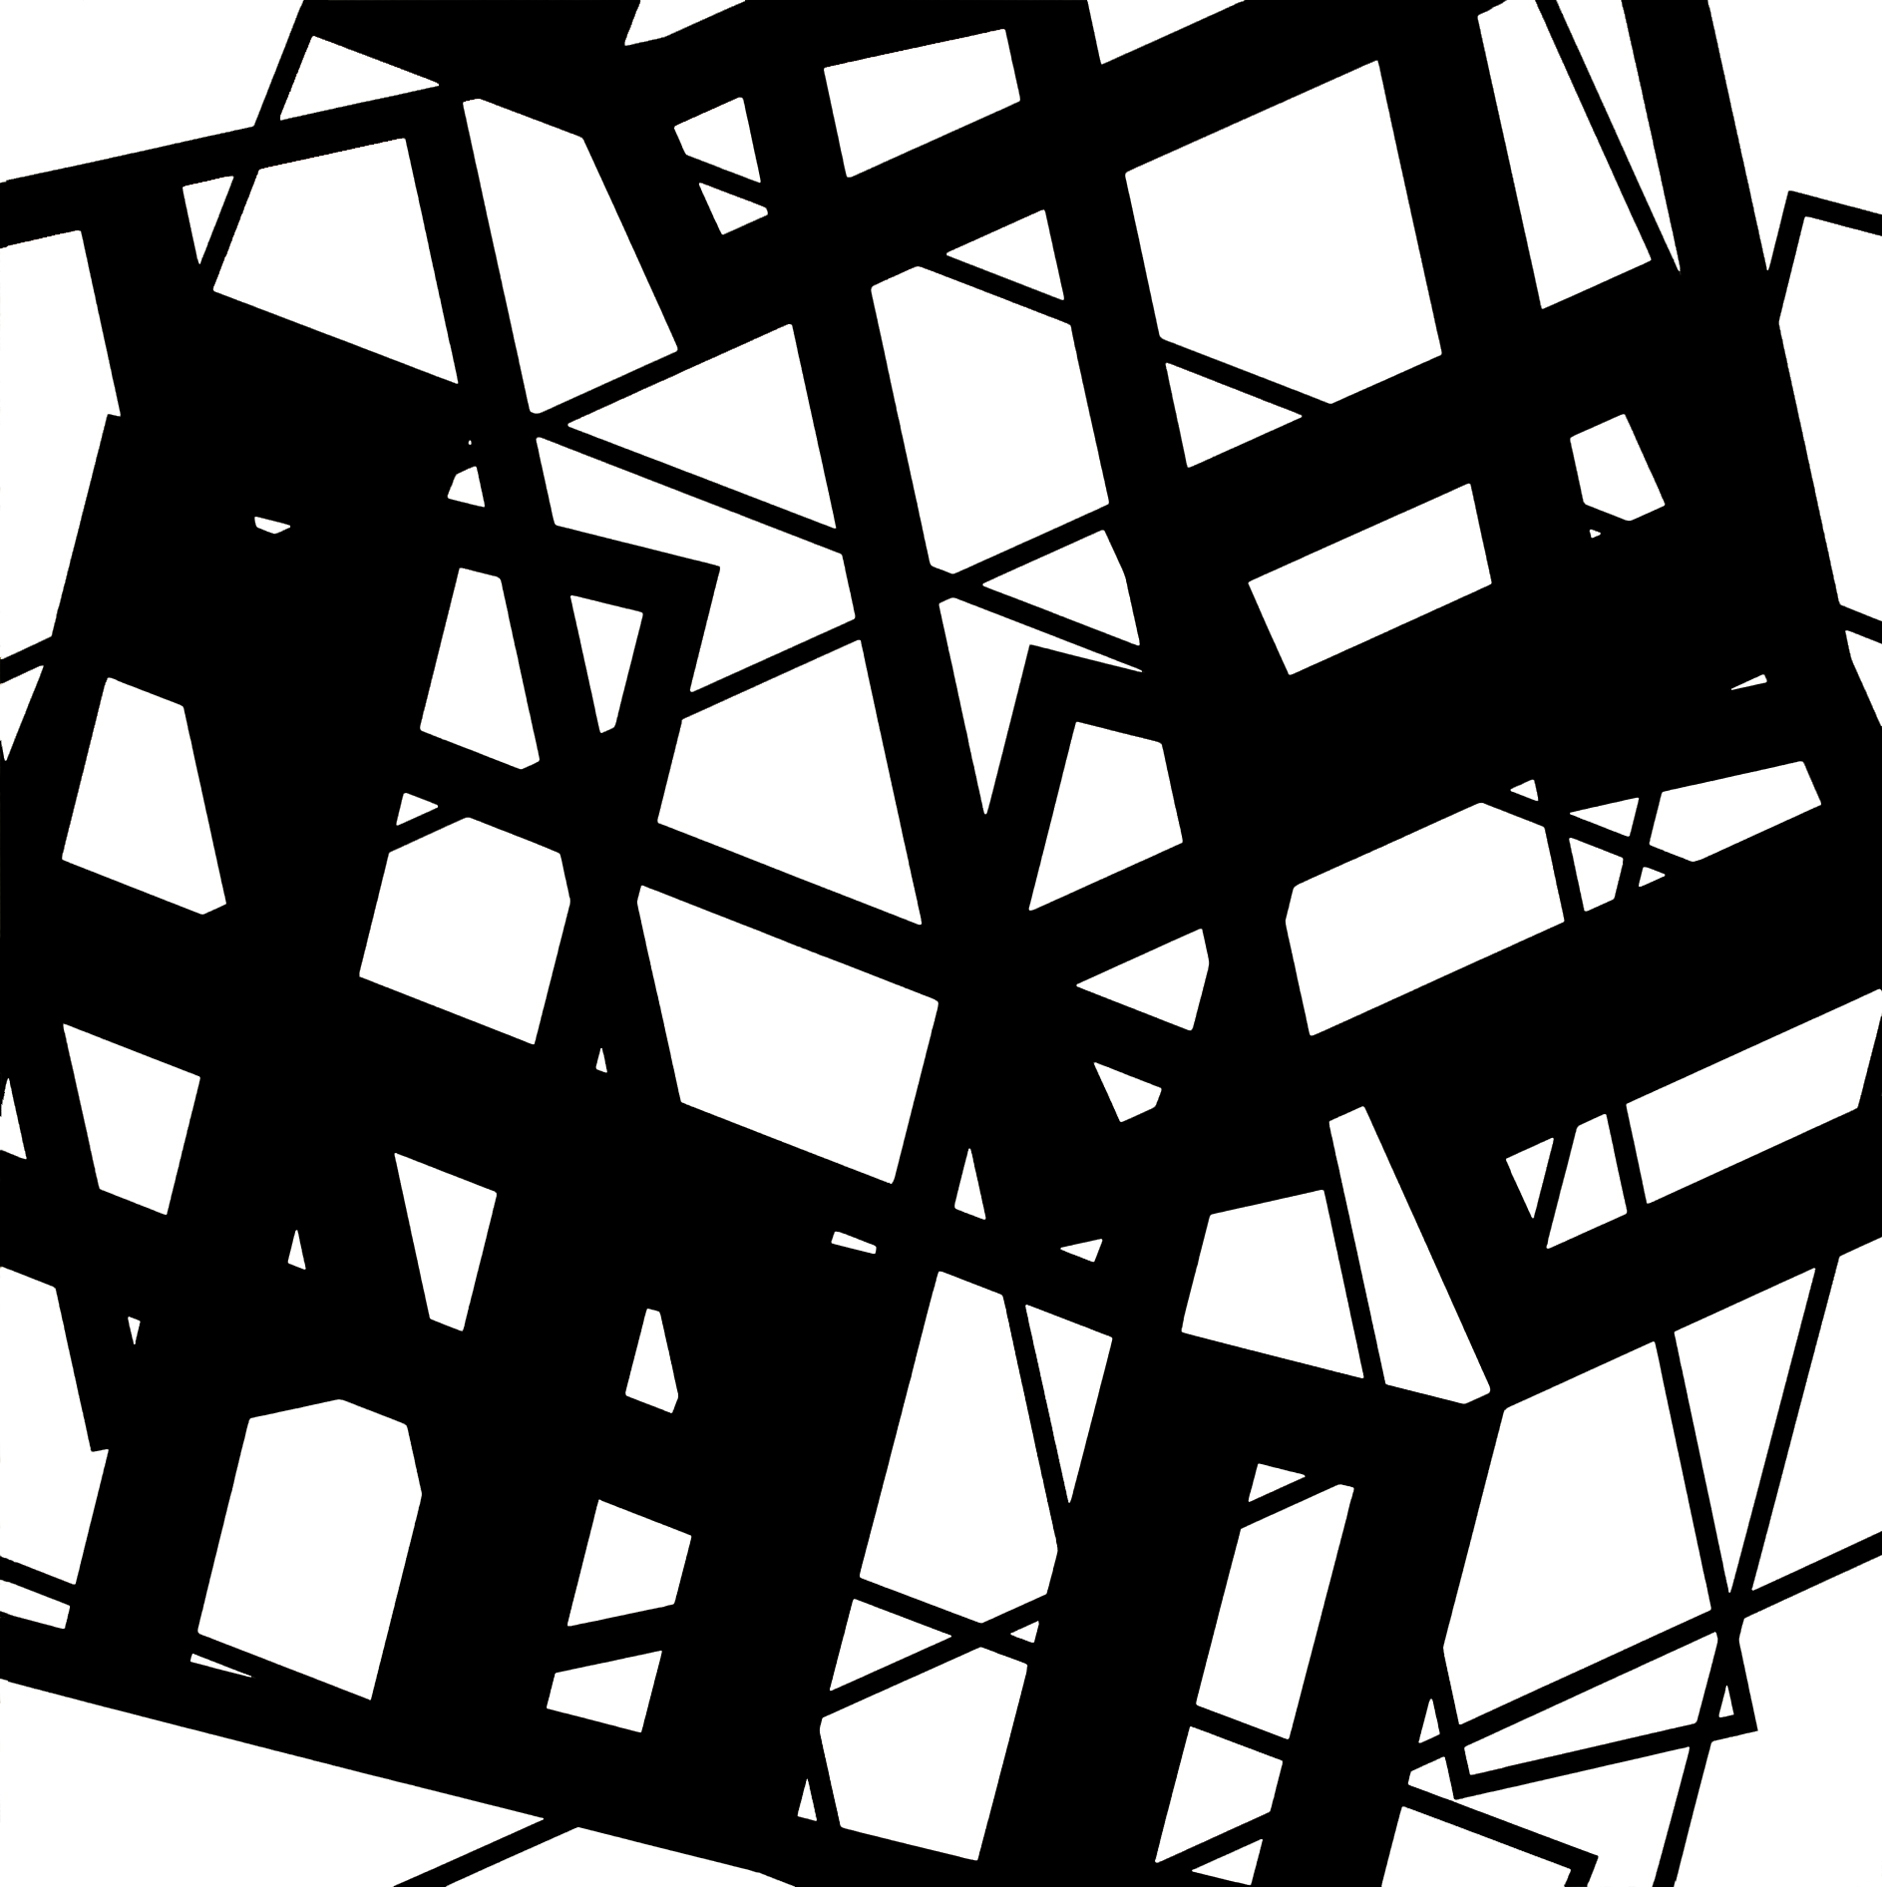 wolsky-andras-02.jpg